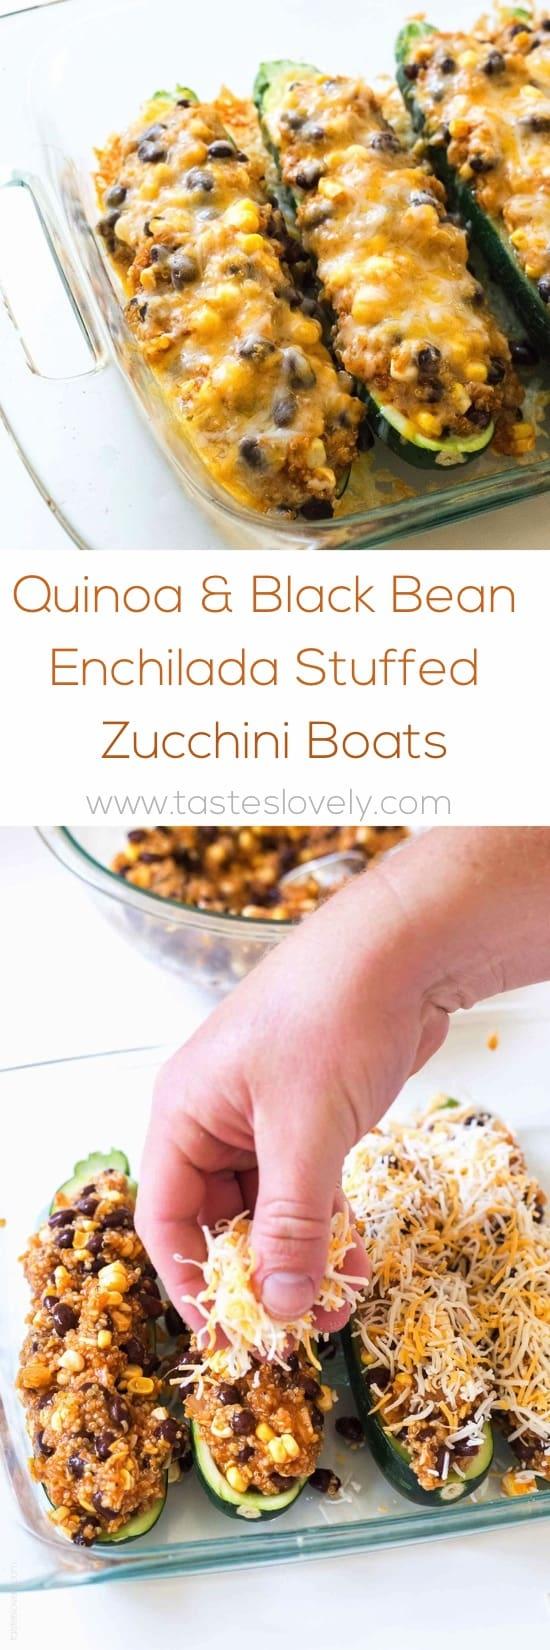 Quinoa & Black Bean Enchilada Stuffed Zucchinis (gluten free)